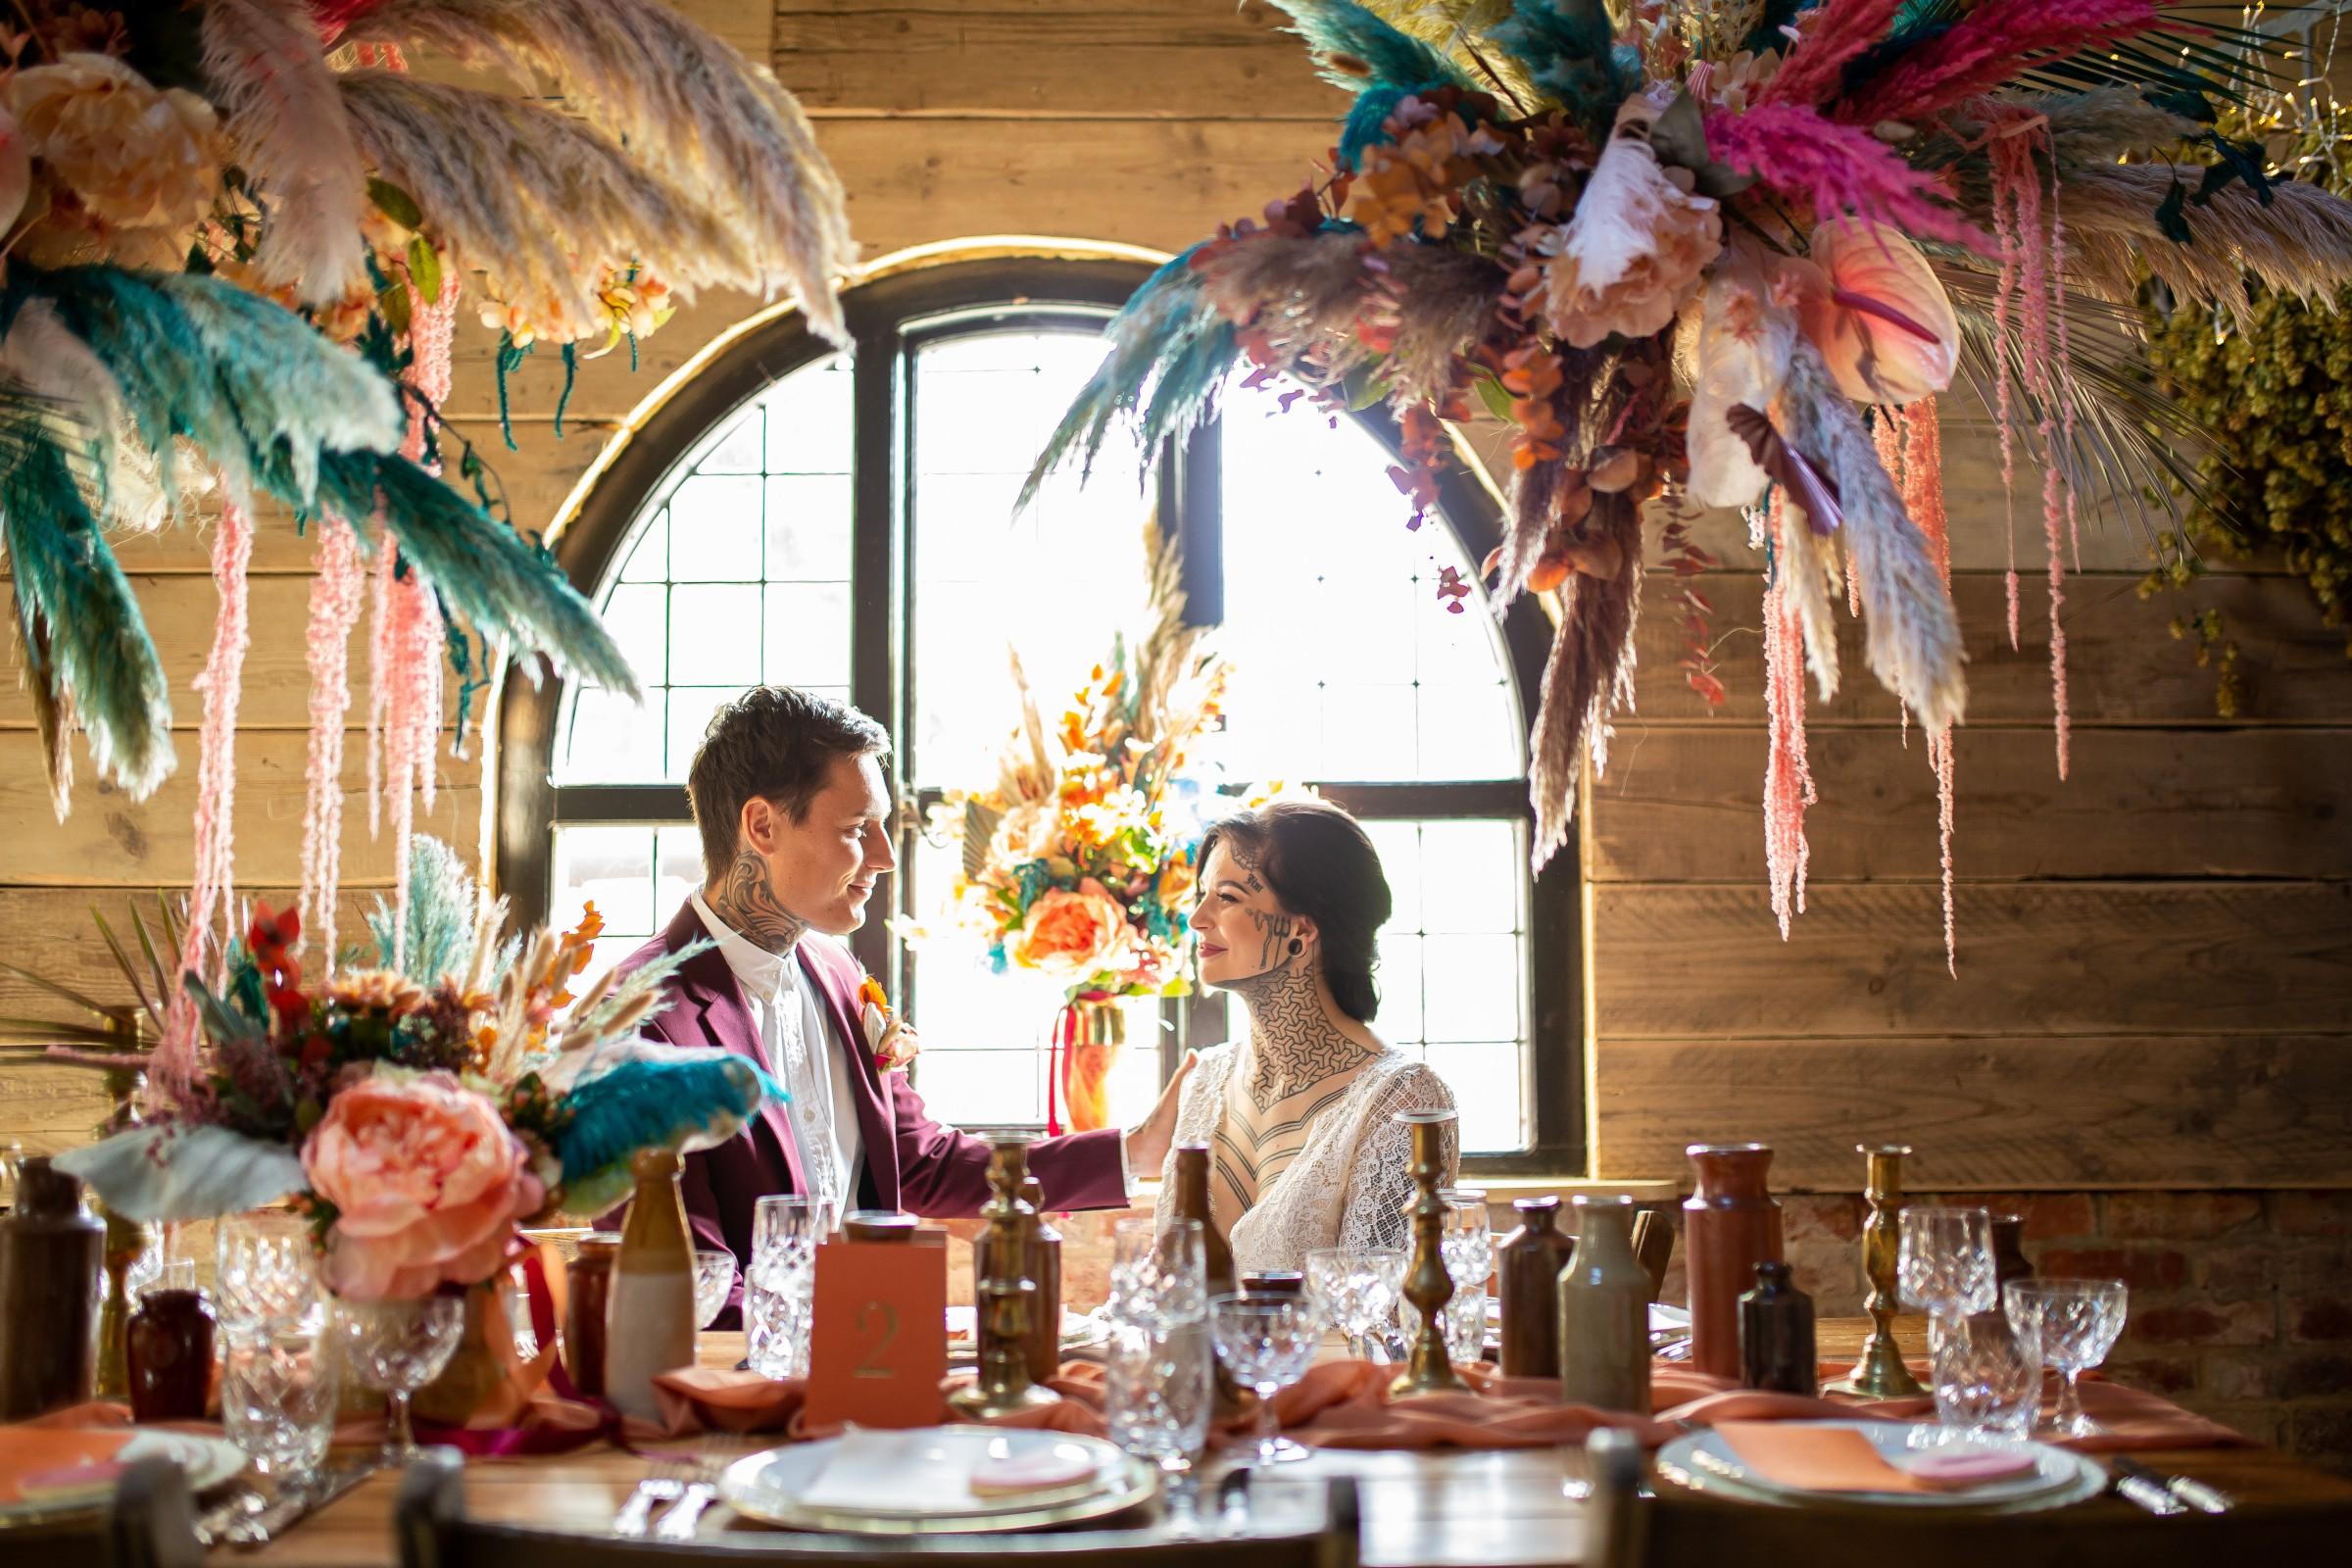 unique barn wedding - creative wedding styling - bright wedding - modern wedding - unique wedding flowers - colourful wedding flowers - wedding table styling - unconventional wedding